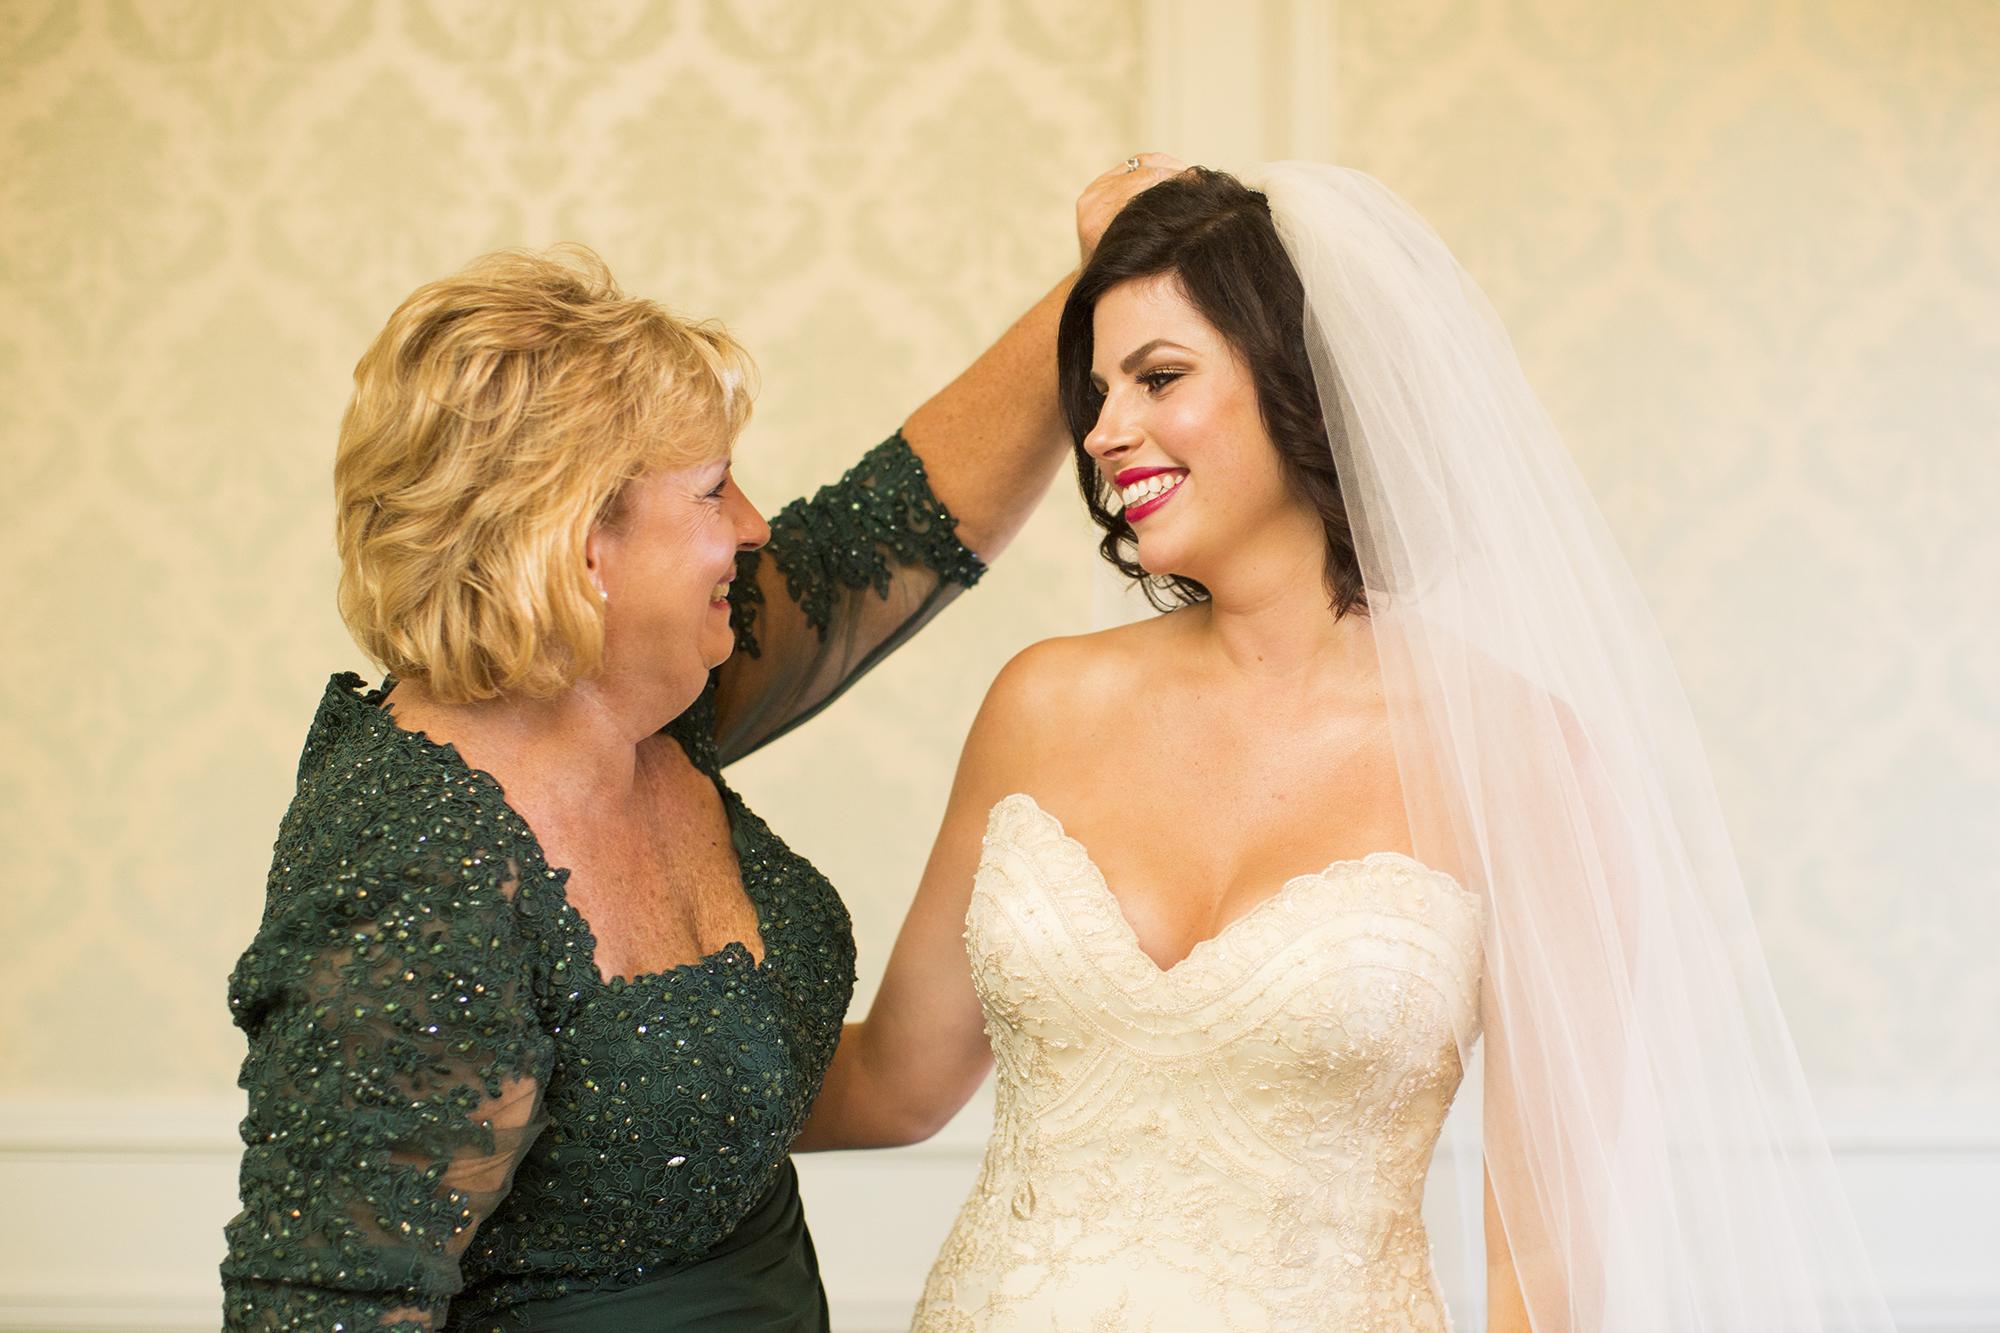 Seriously_Sabrina_Photography_Lexington_Kentucky_Wedding_Photographer_Boone834.jpg